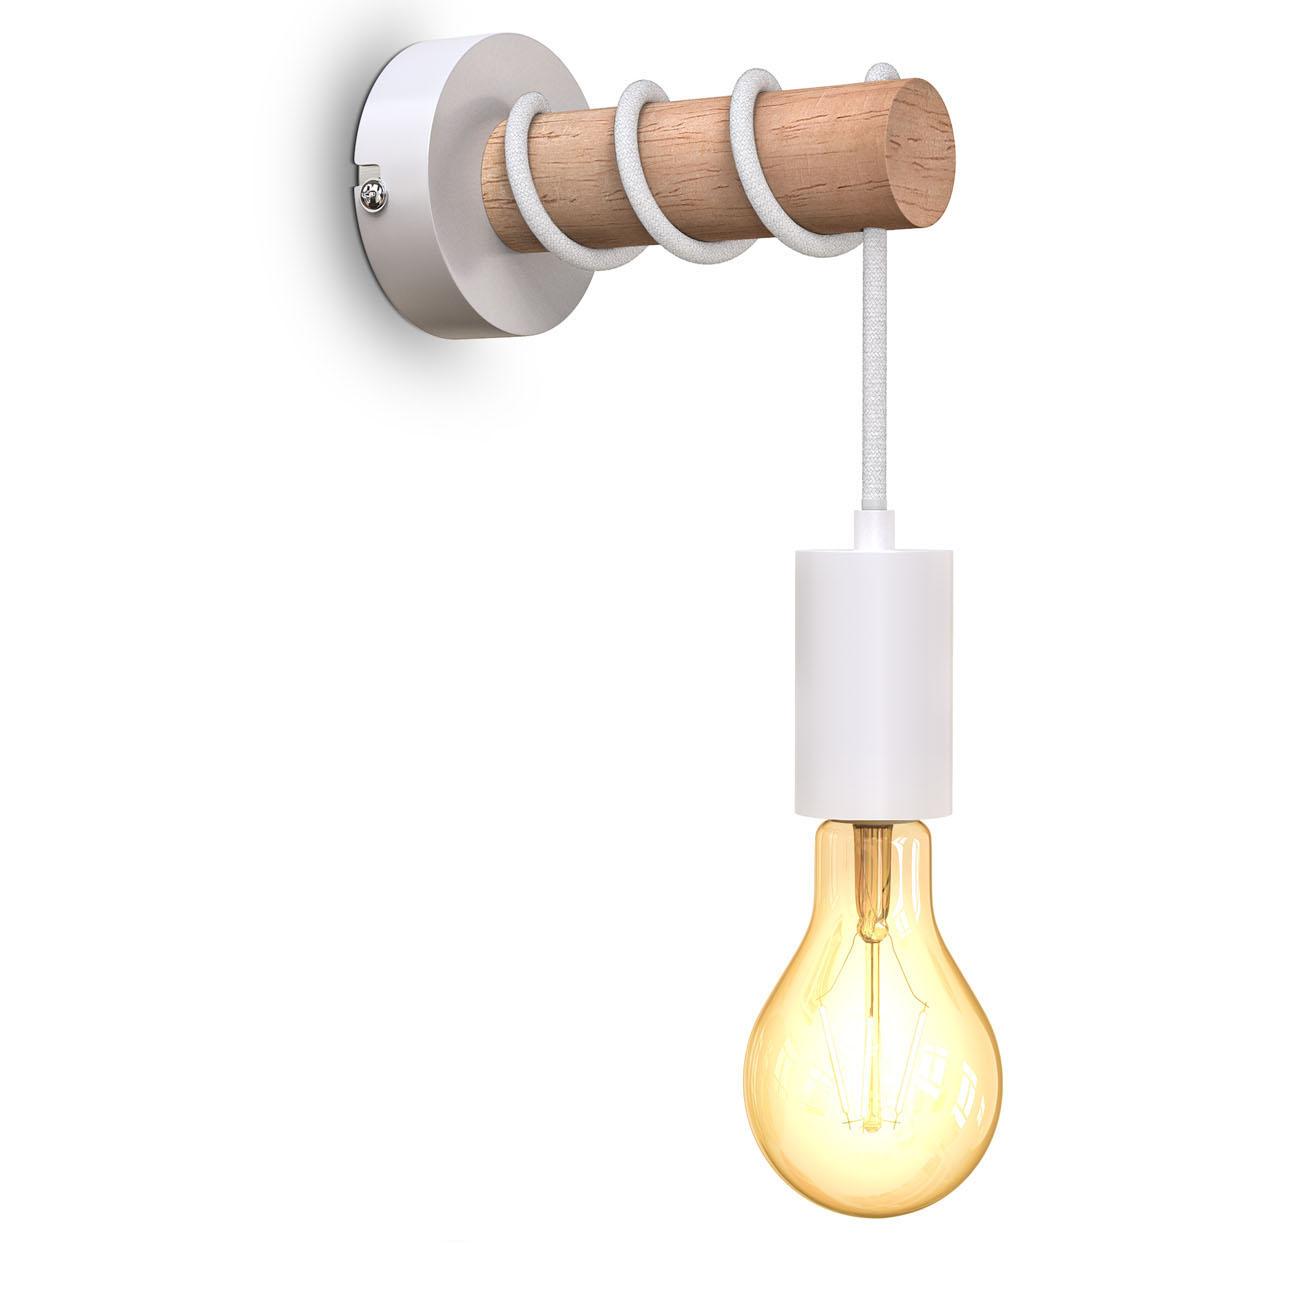 Retro Wandleuchte Metall-Holz-Optik weiß E27